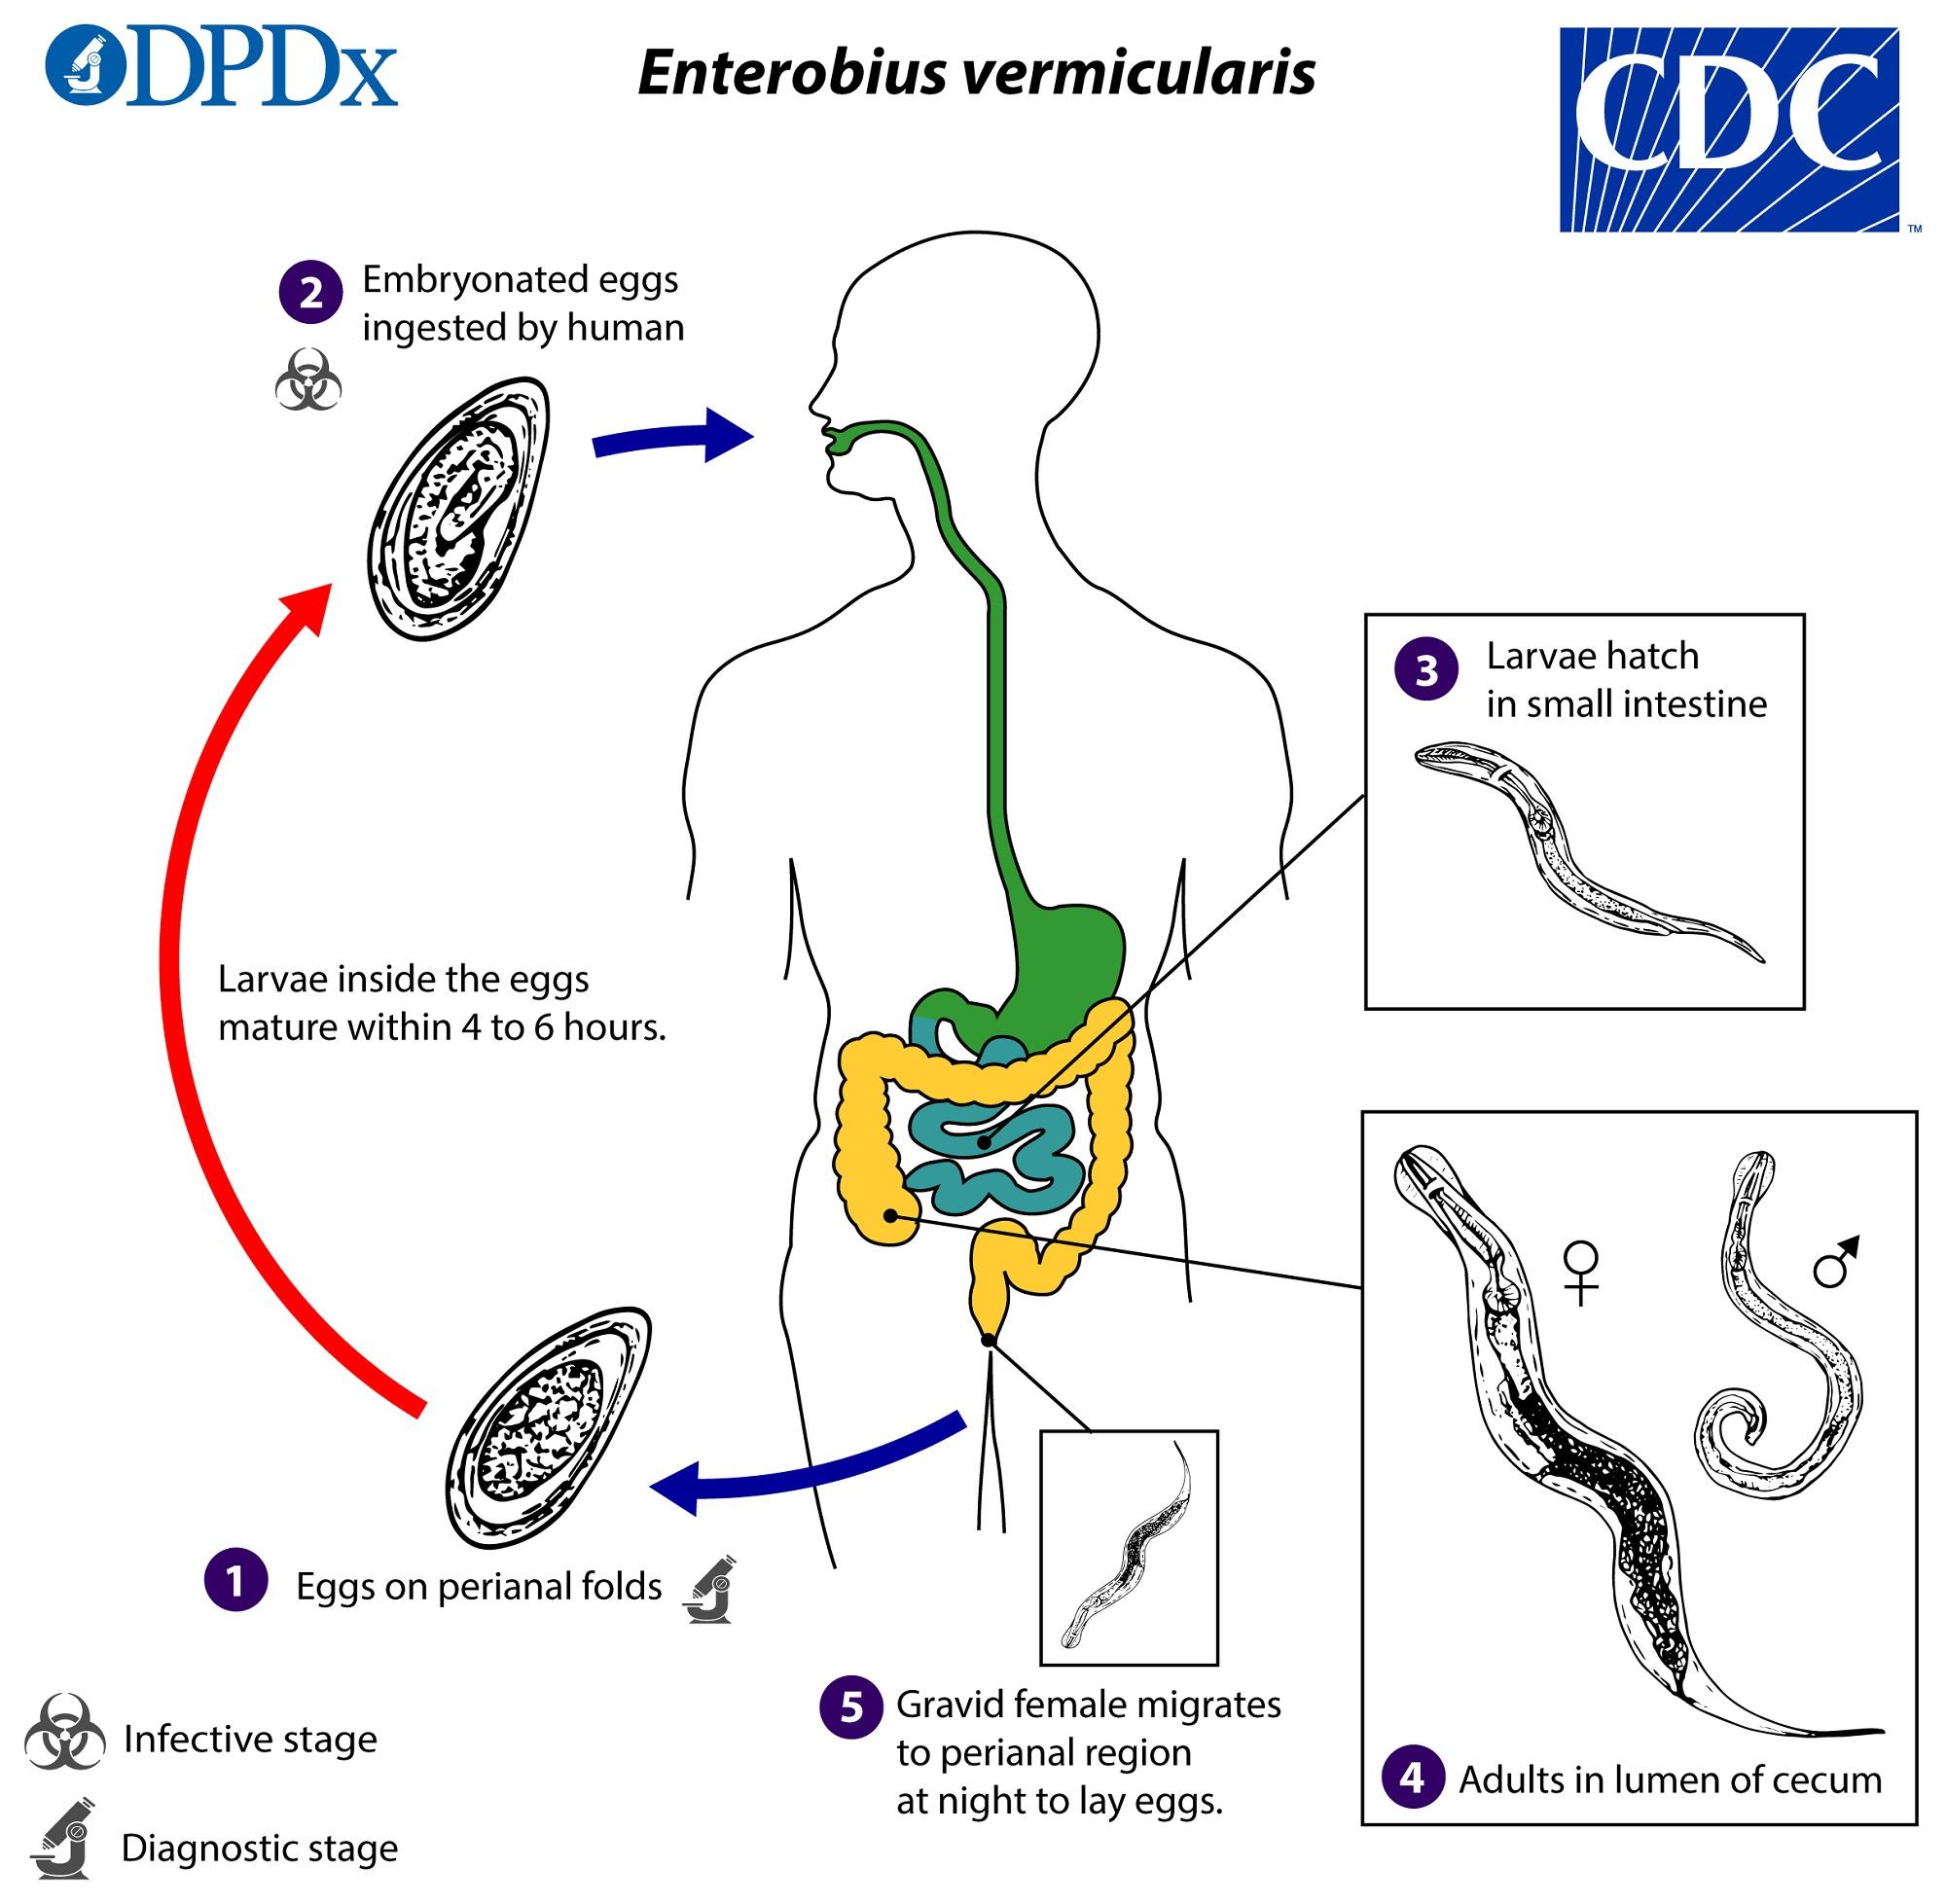 enterobius vermicularis diagram viermițori intestinali